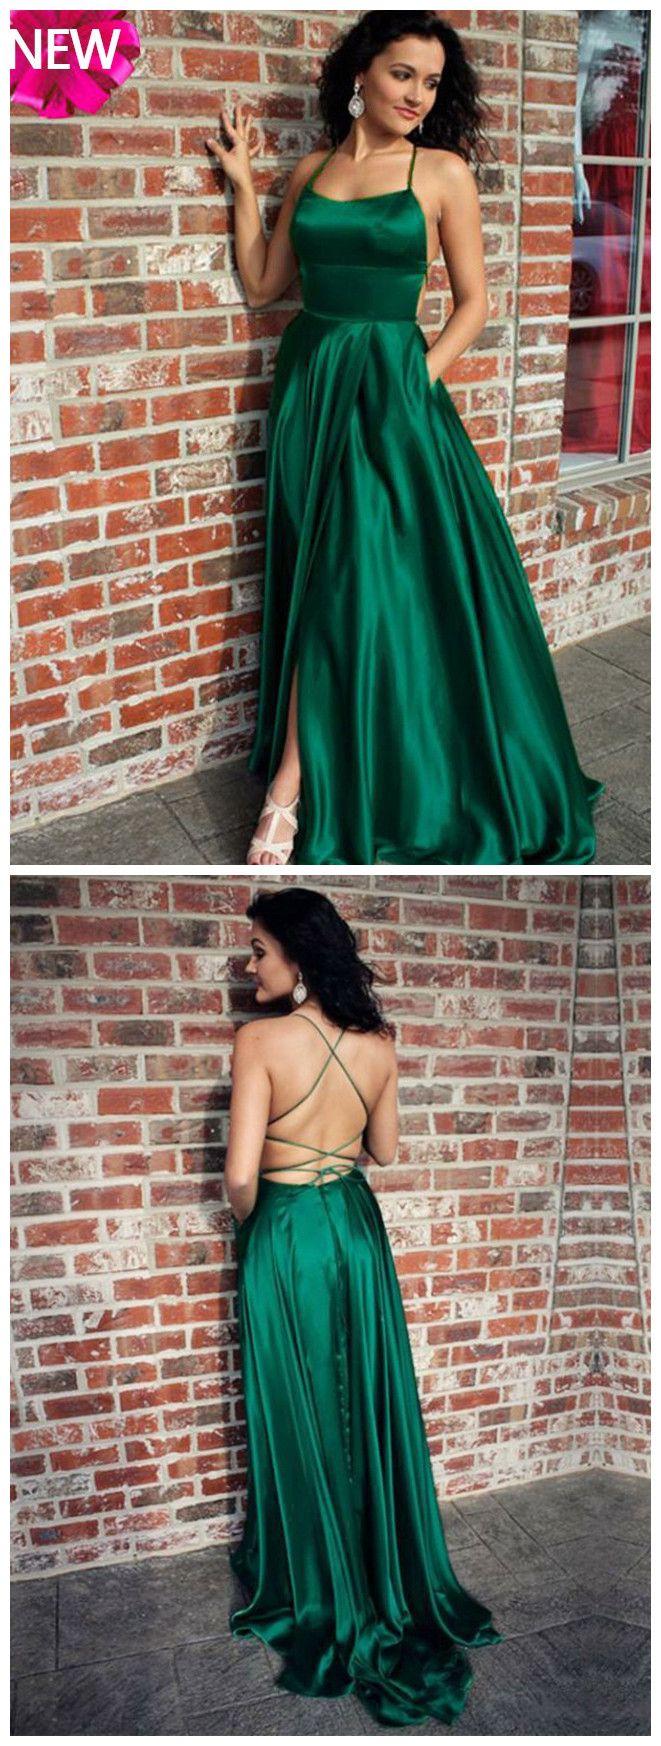 chic aline prom dresses hunter spaghetti straps long prom